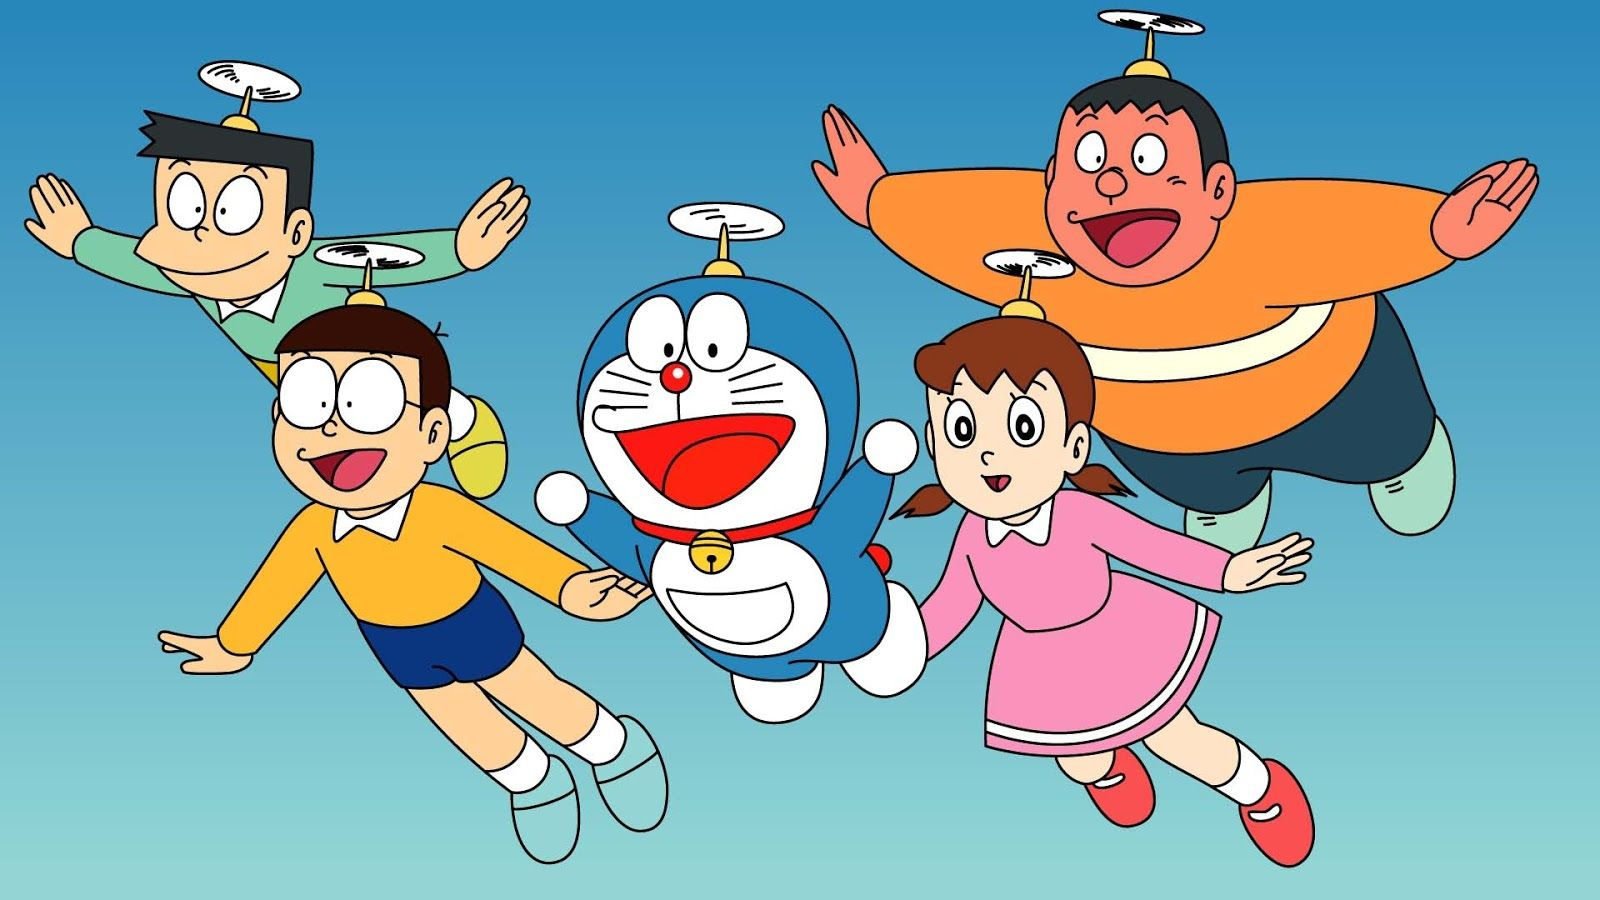 Wallpaper Doraemon Keren Gambar Doraemon Lucu Dan Imut